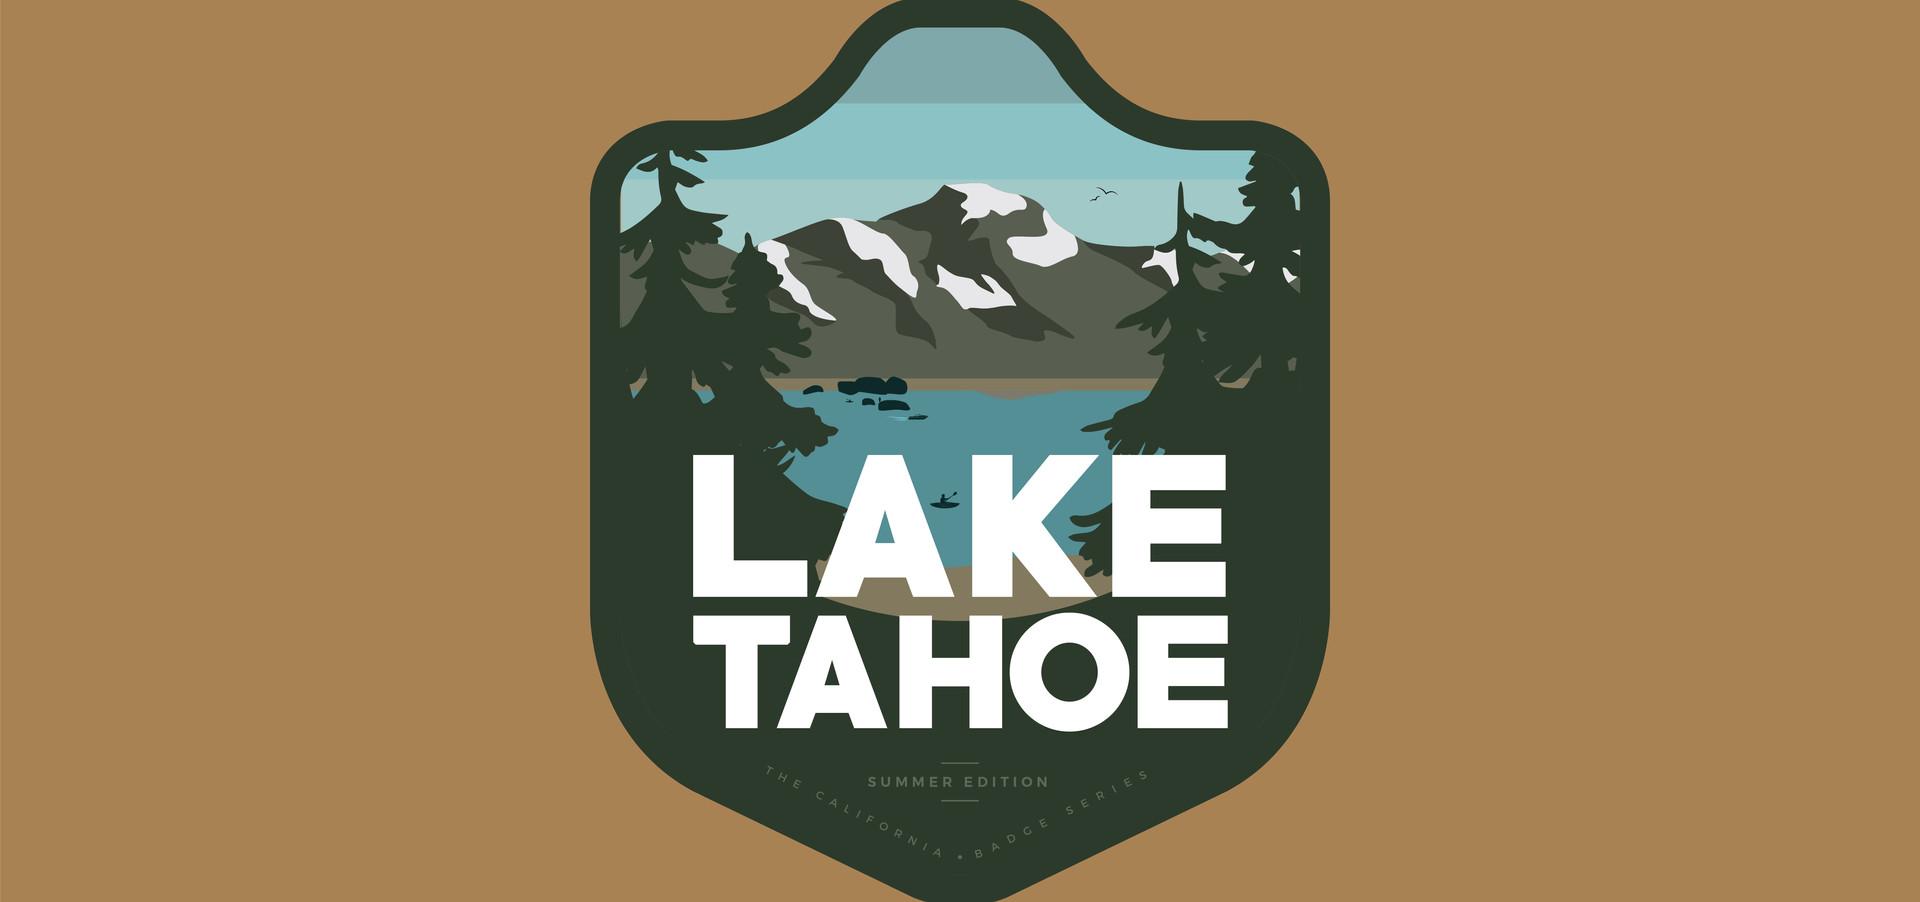 LakeTahoe-06.jpg